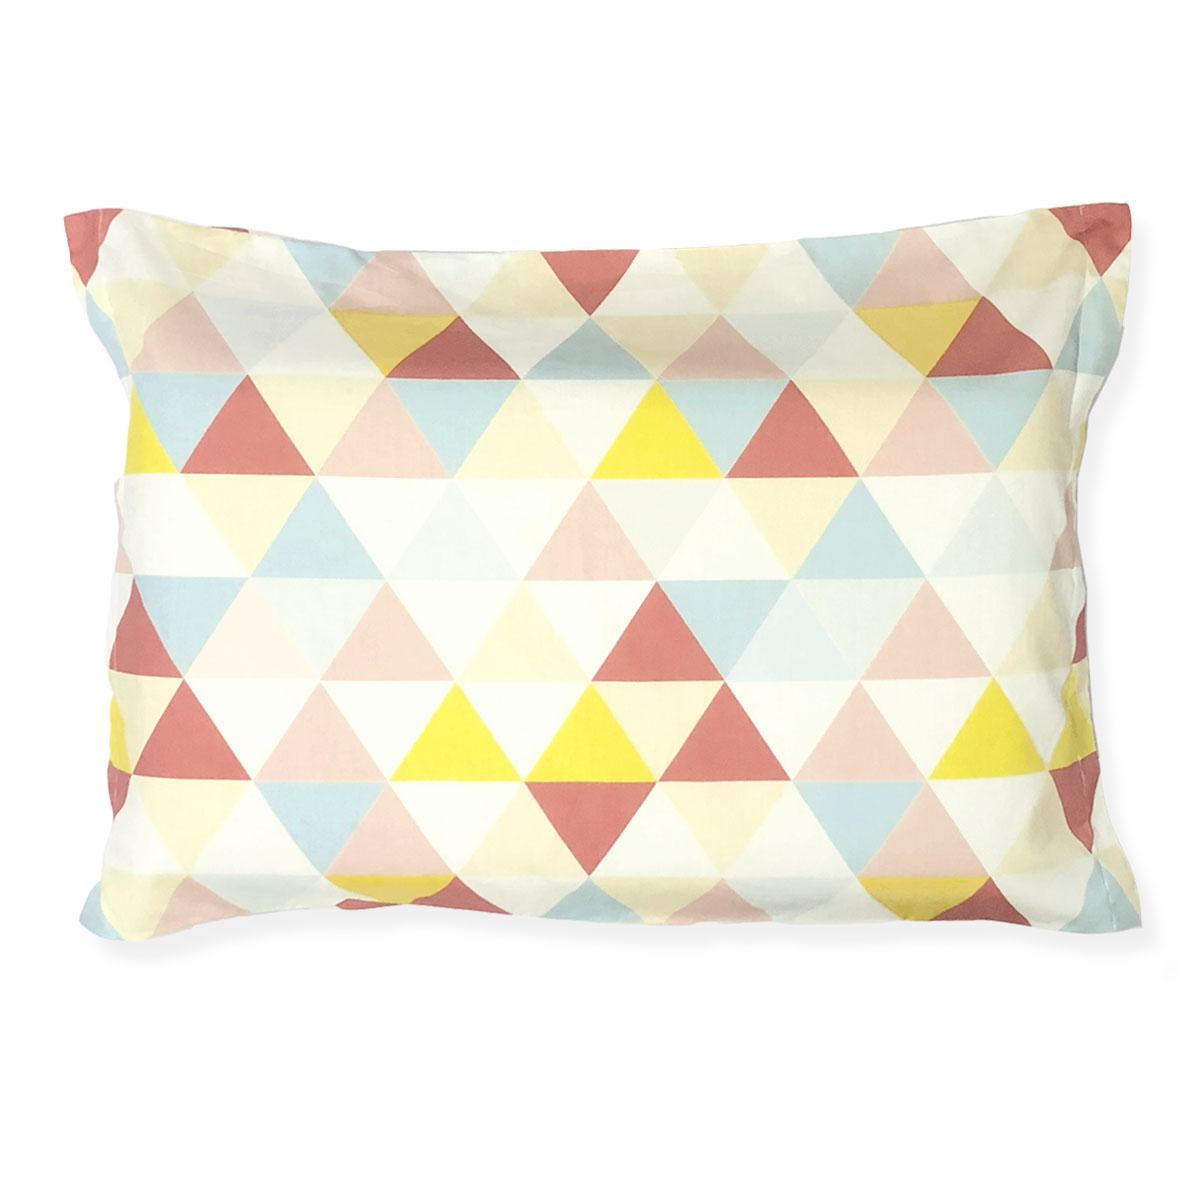 Fronha Triângulos Rosa, Amarelo E Azul